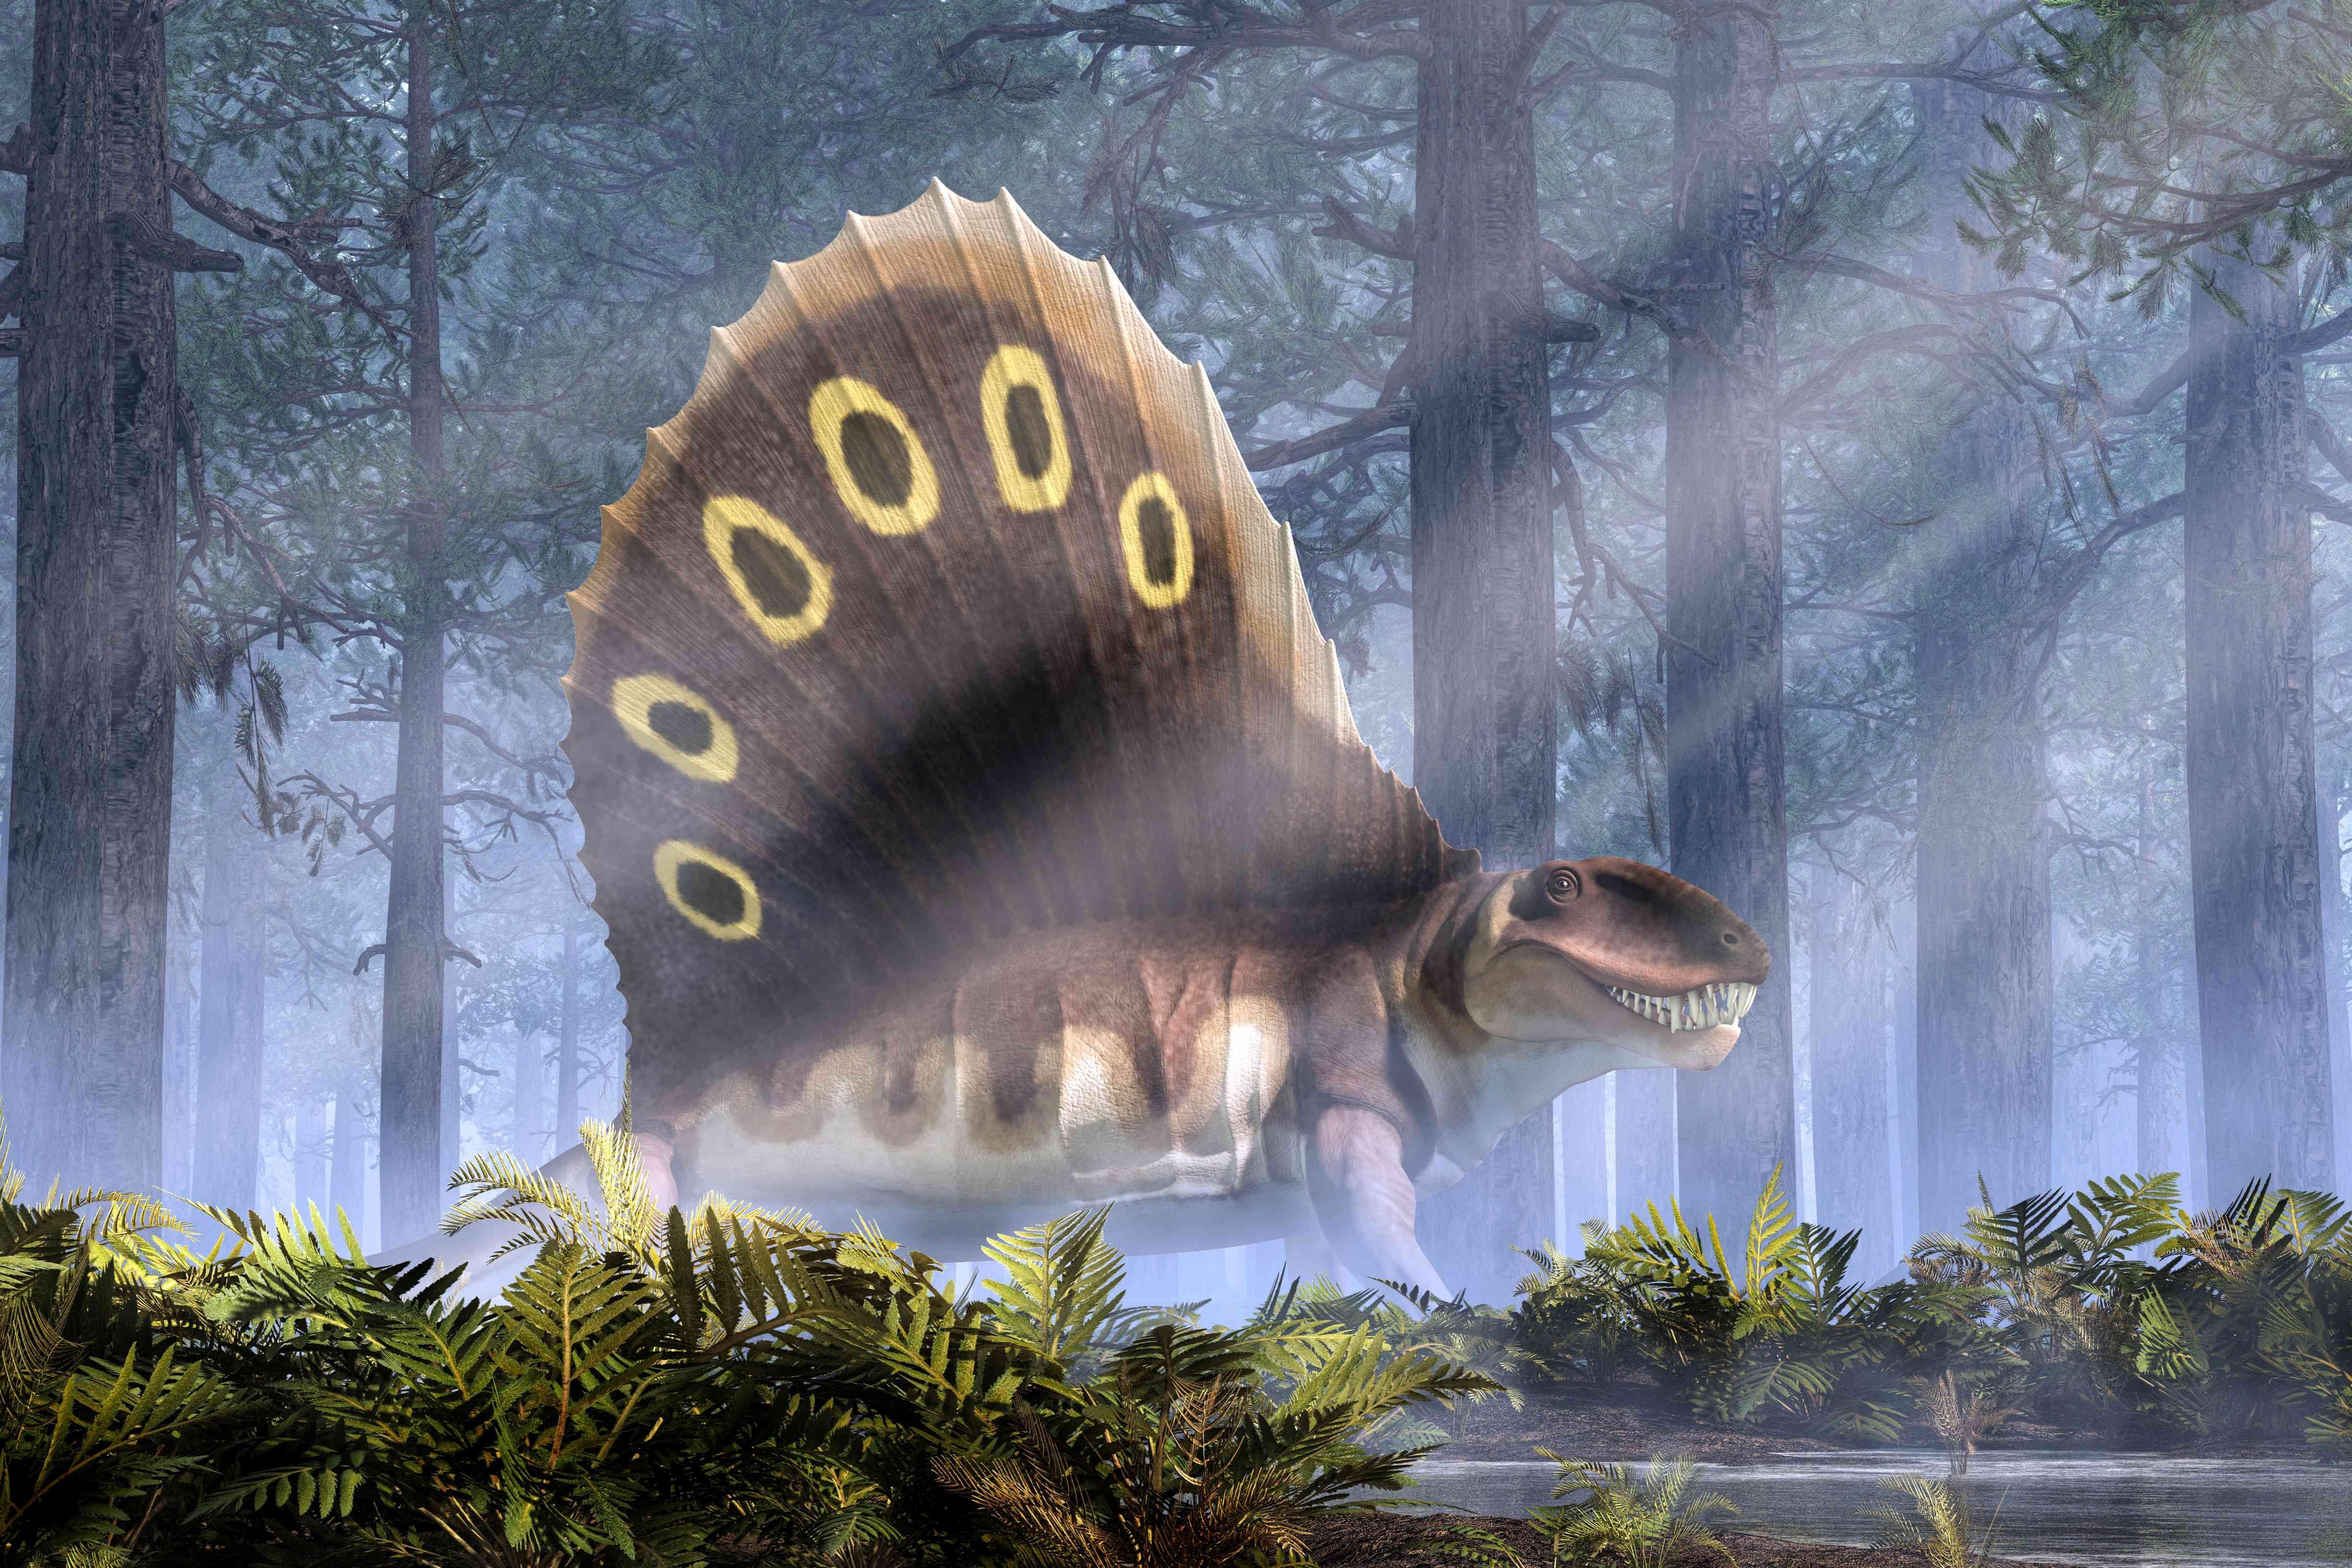 Dimetrodon walks throug a misty forest